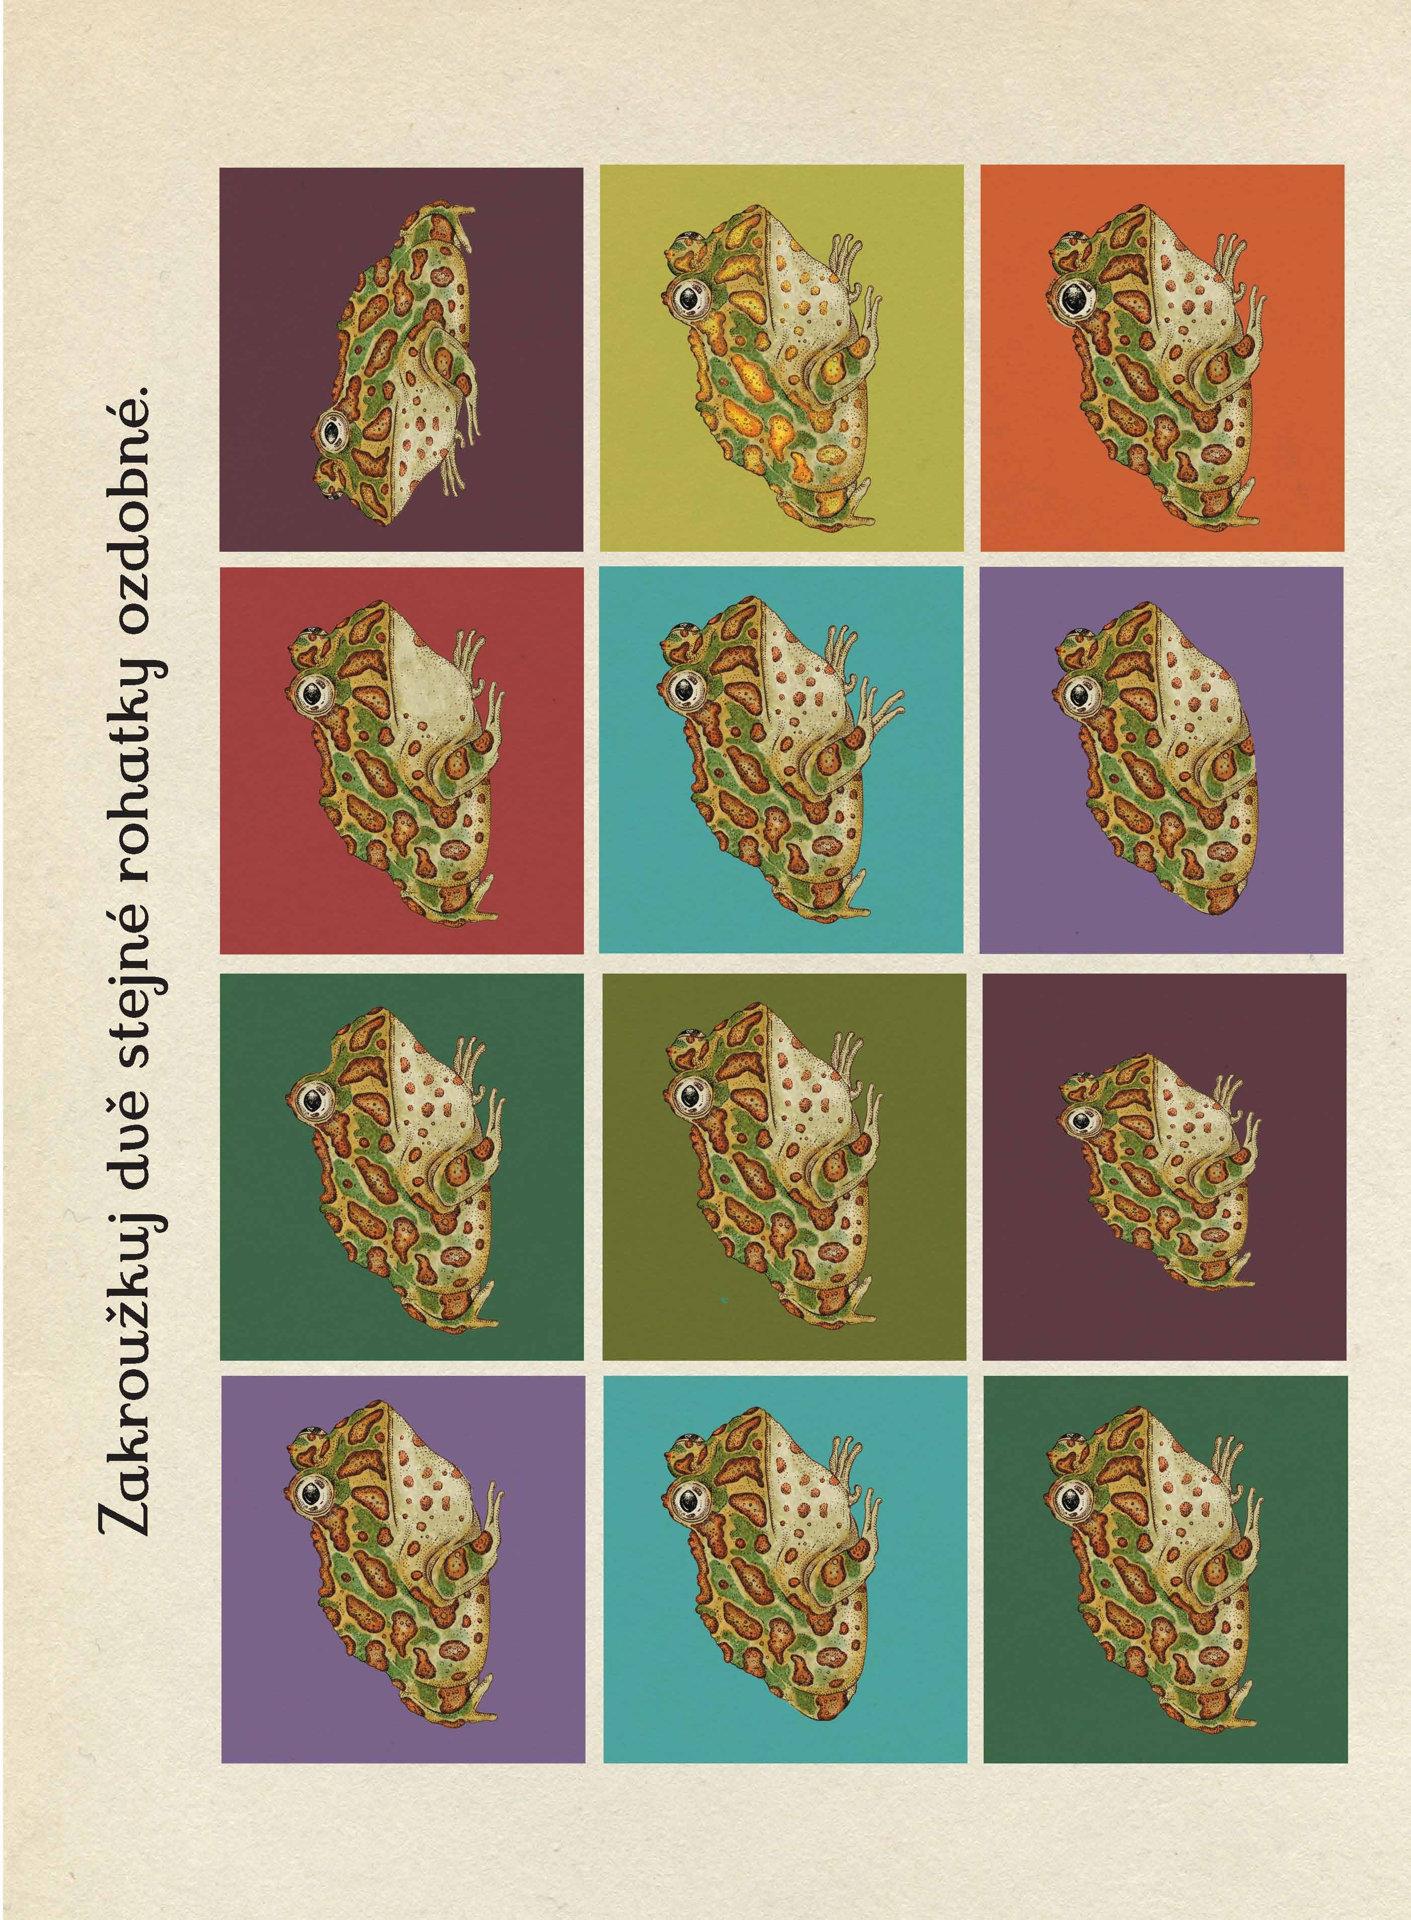 Obrázek Animalium - kniha her